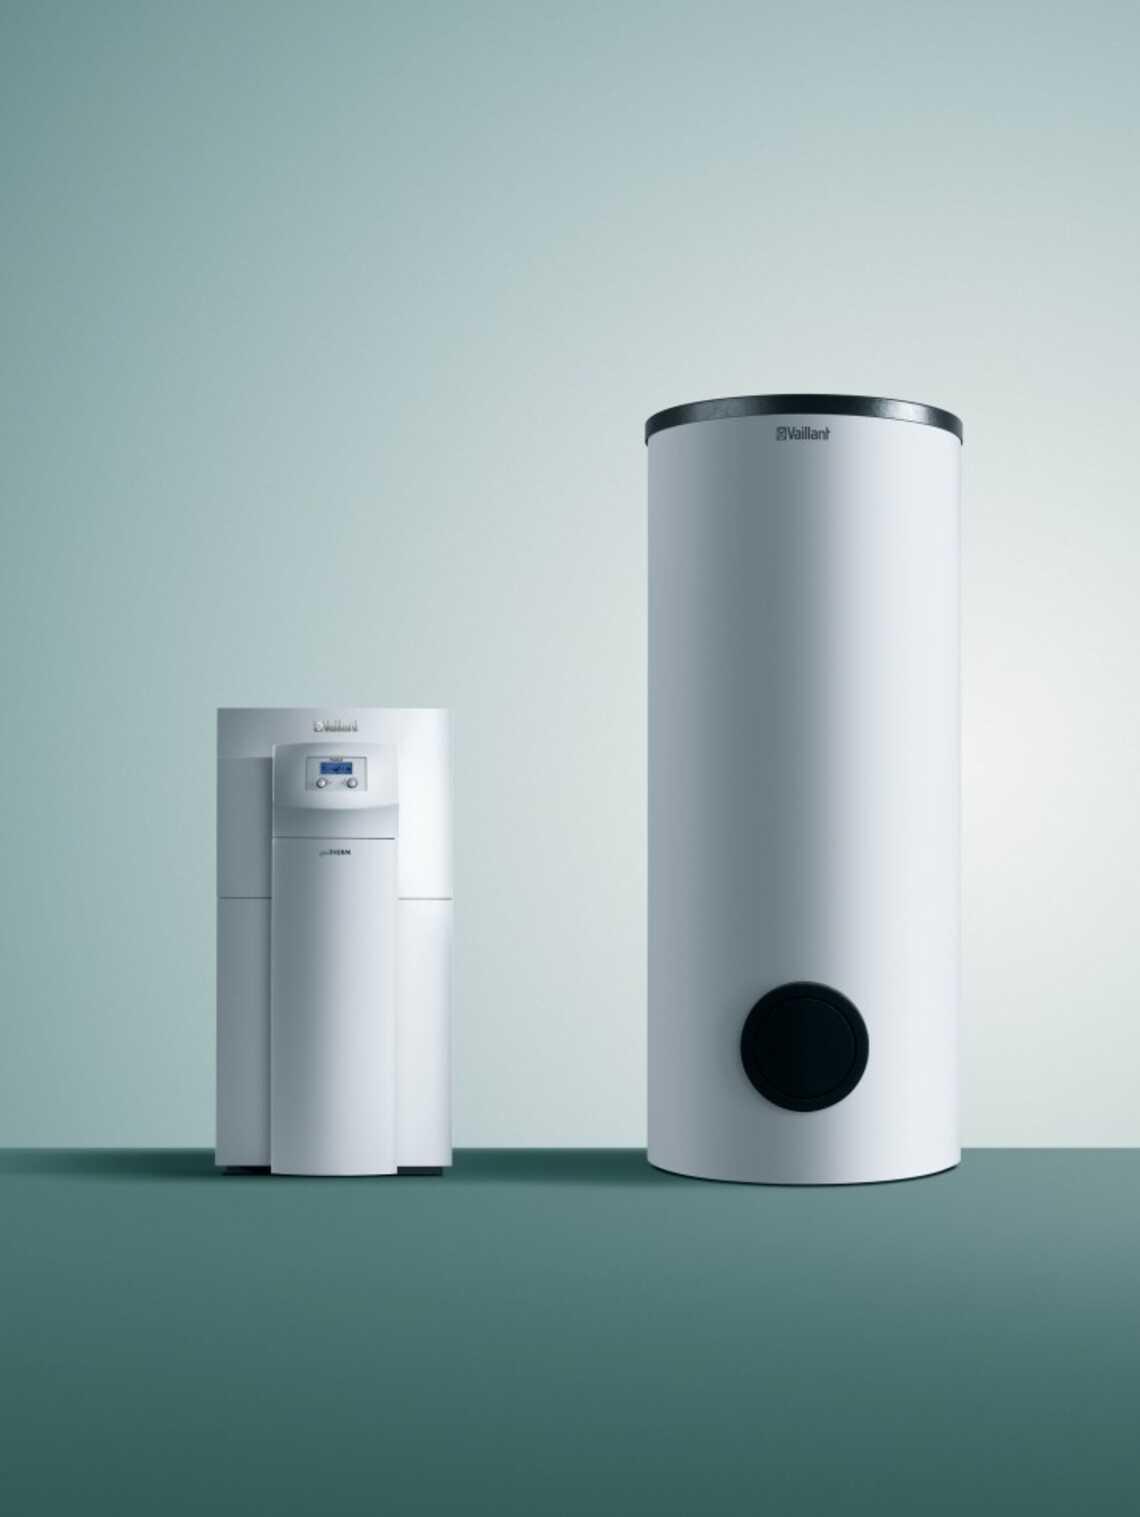 pompes chaleur sol eau geotherm vws 6 17 kw vaillant. Black Bedroom Furniture Sets. Home Design Ideas